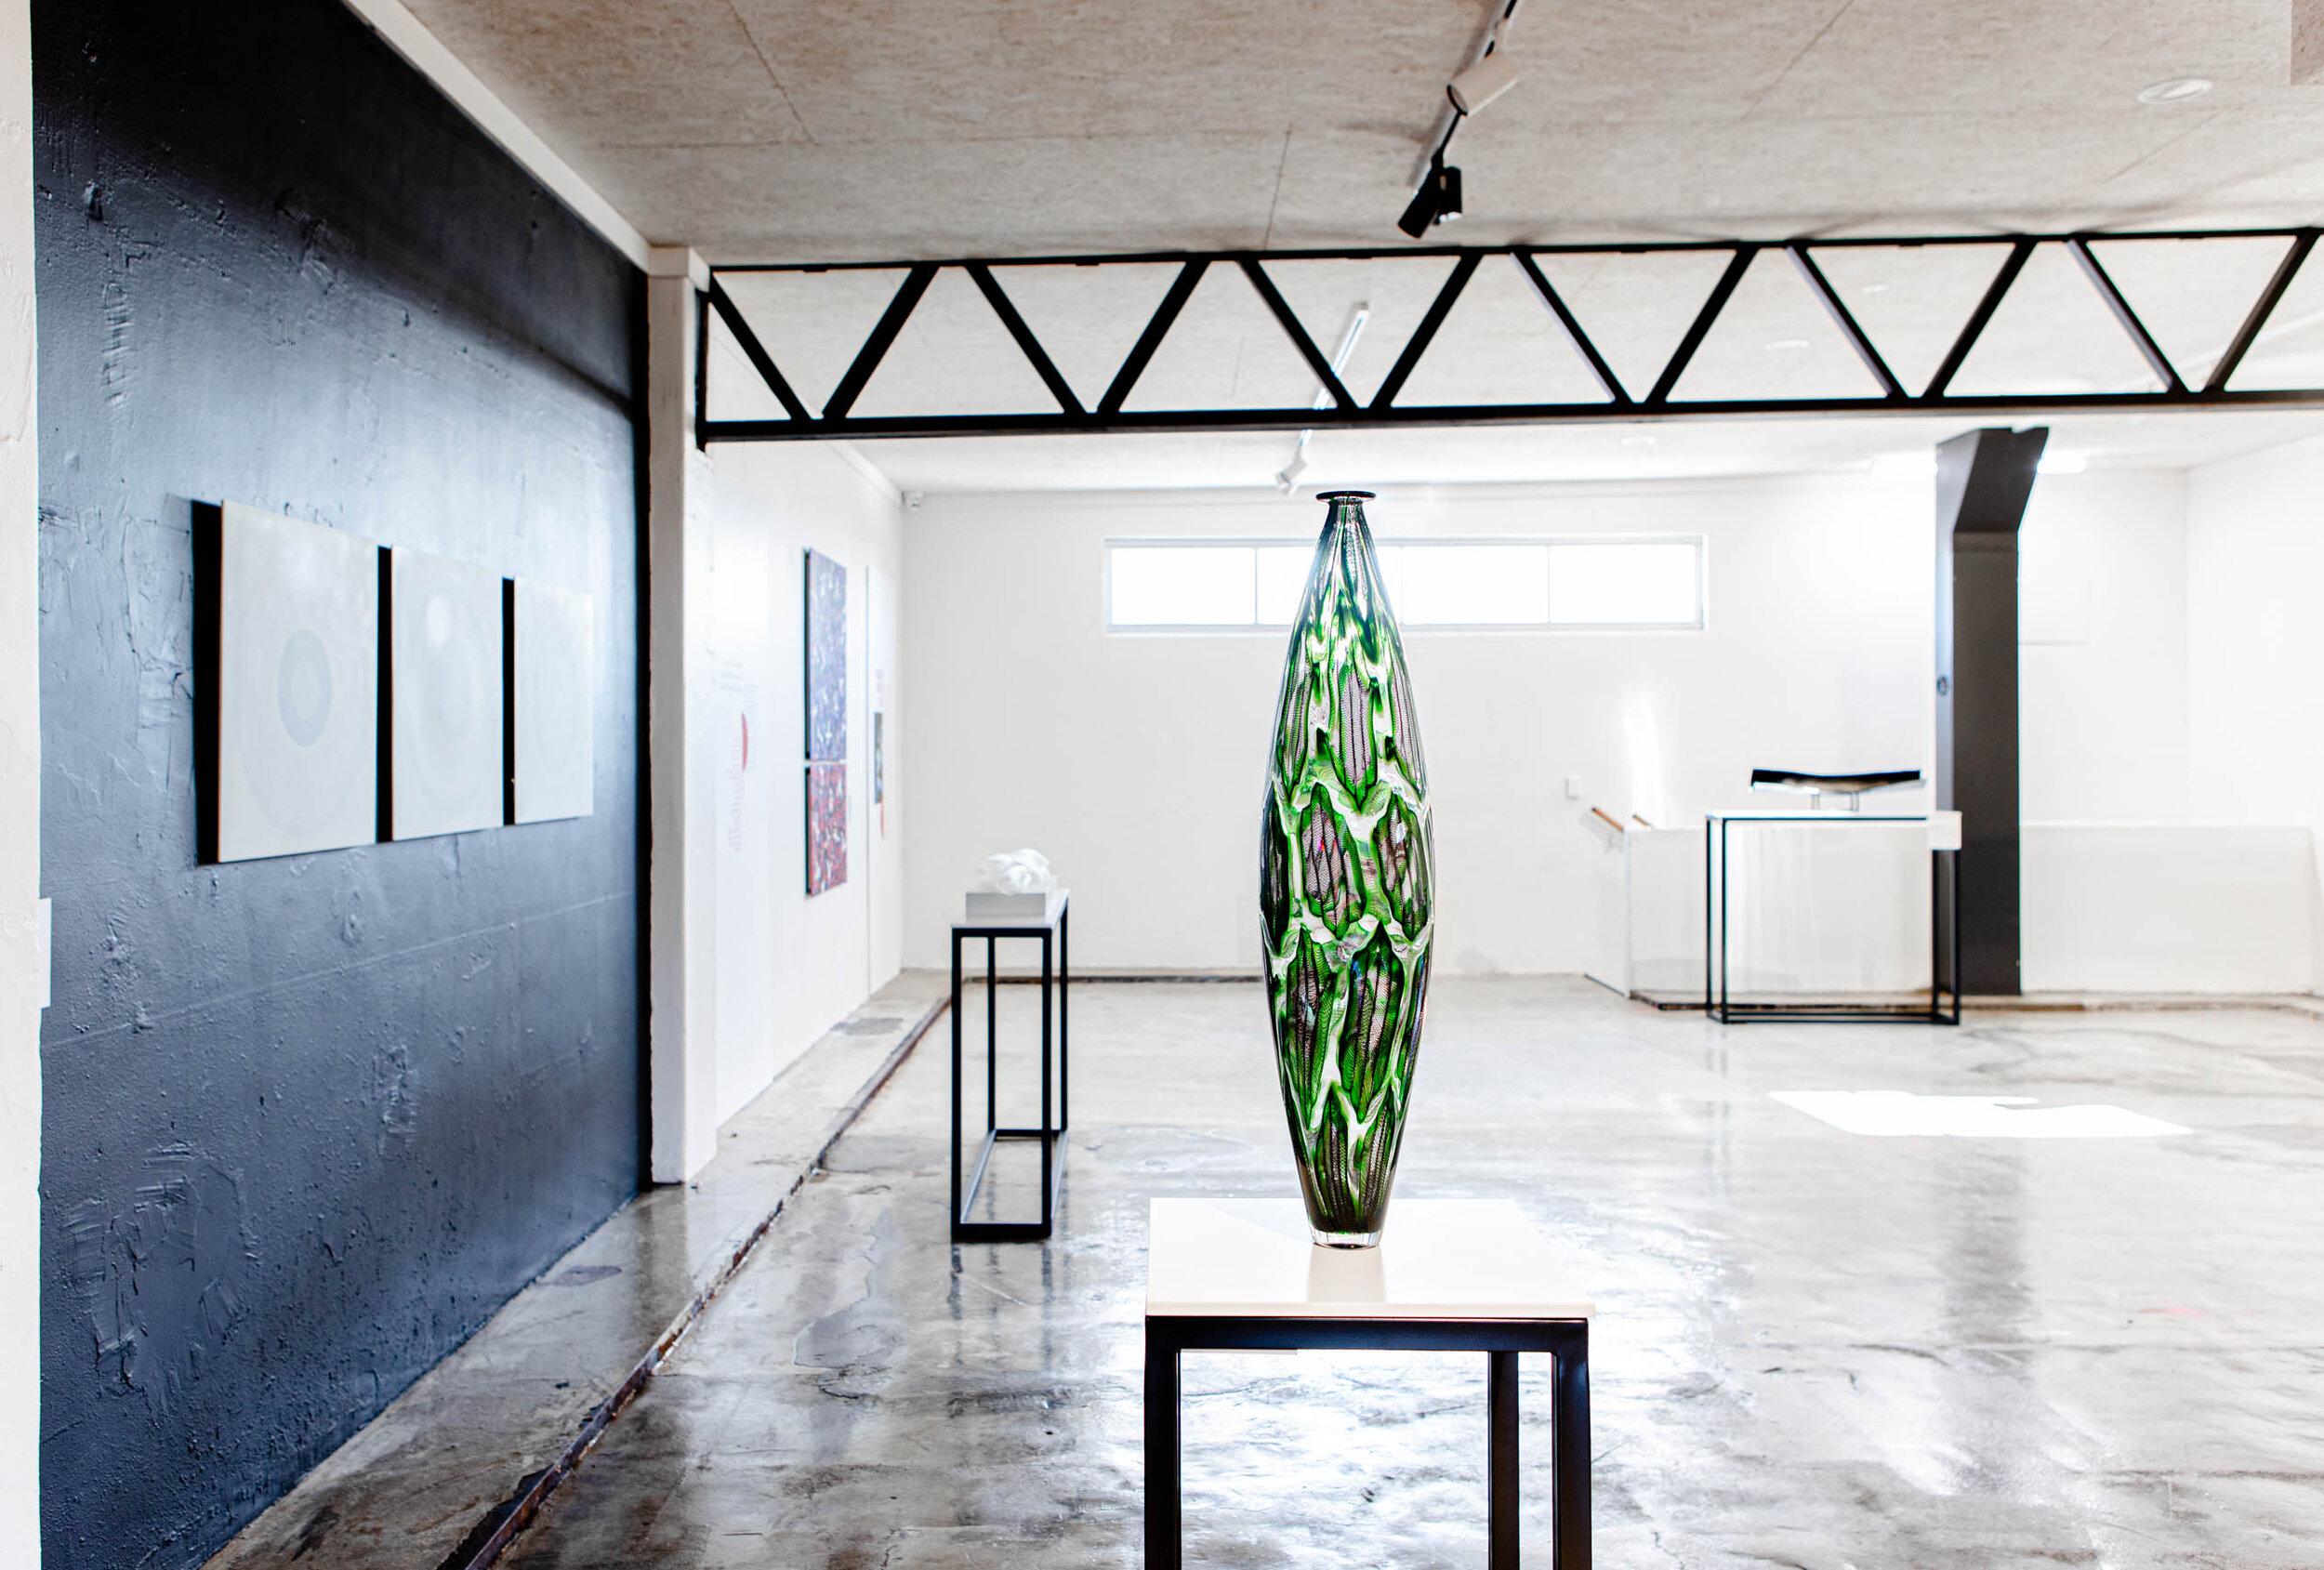 Tom Rowney' s work. Green aventurine motif, with black Zanfirico cane work. Murrini and caneworked blown glass.